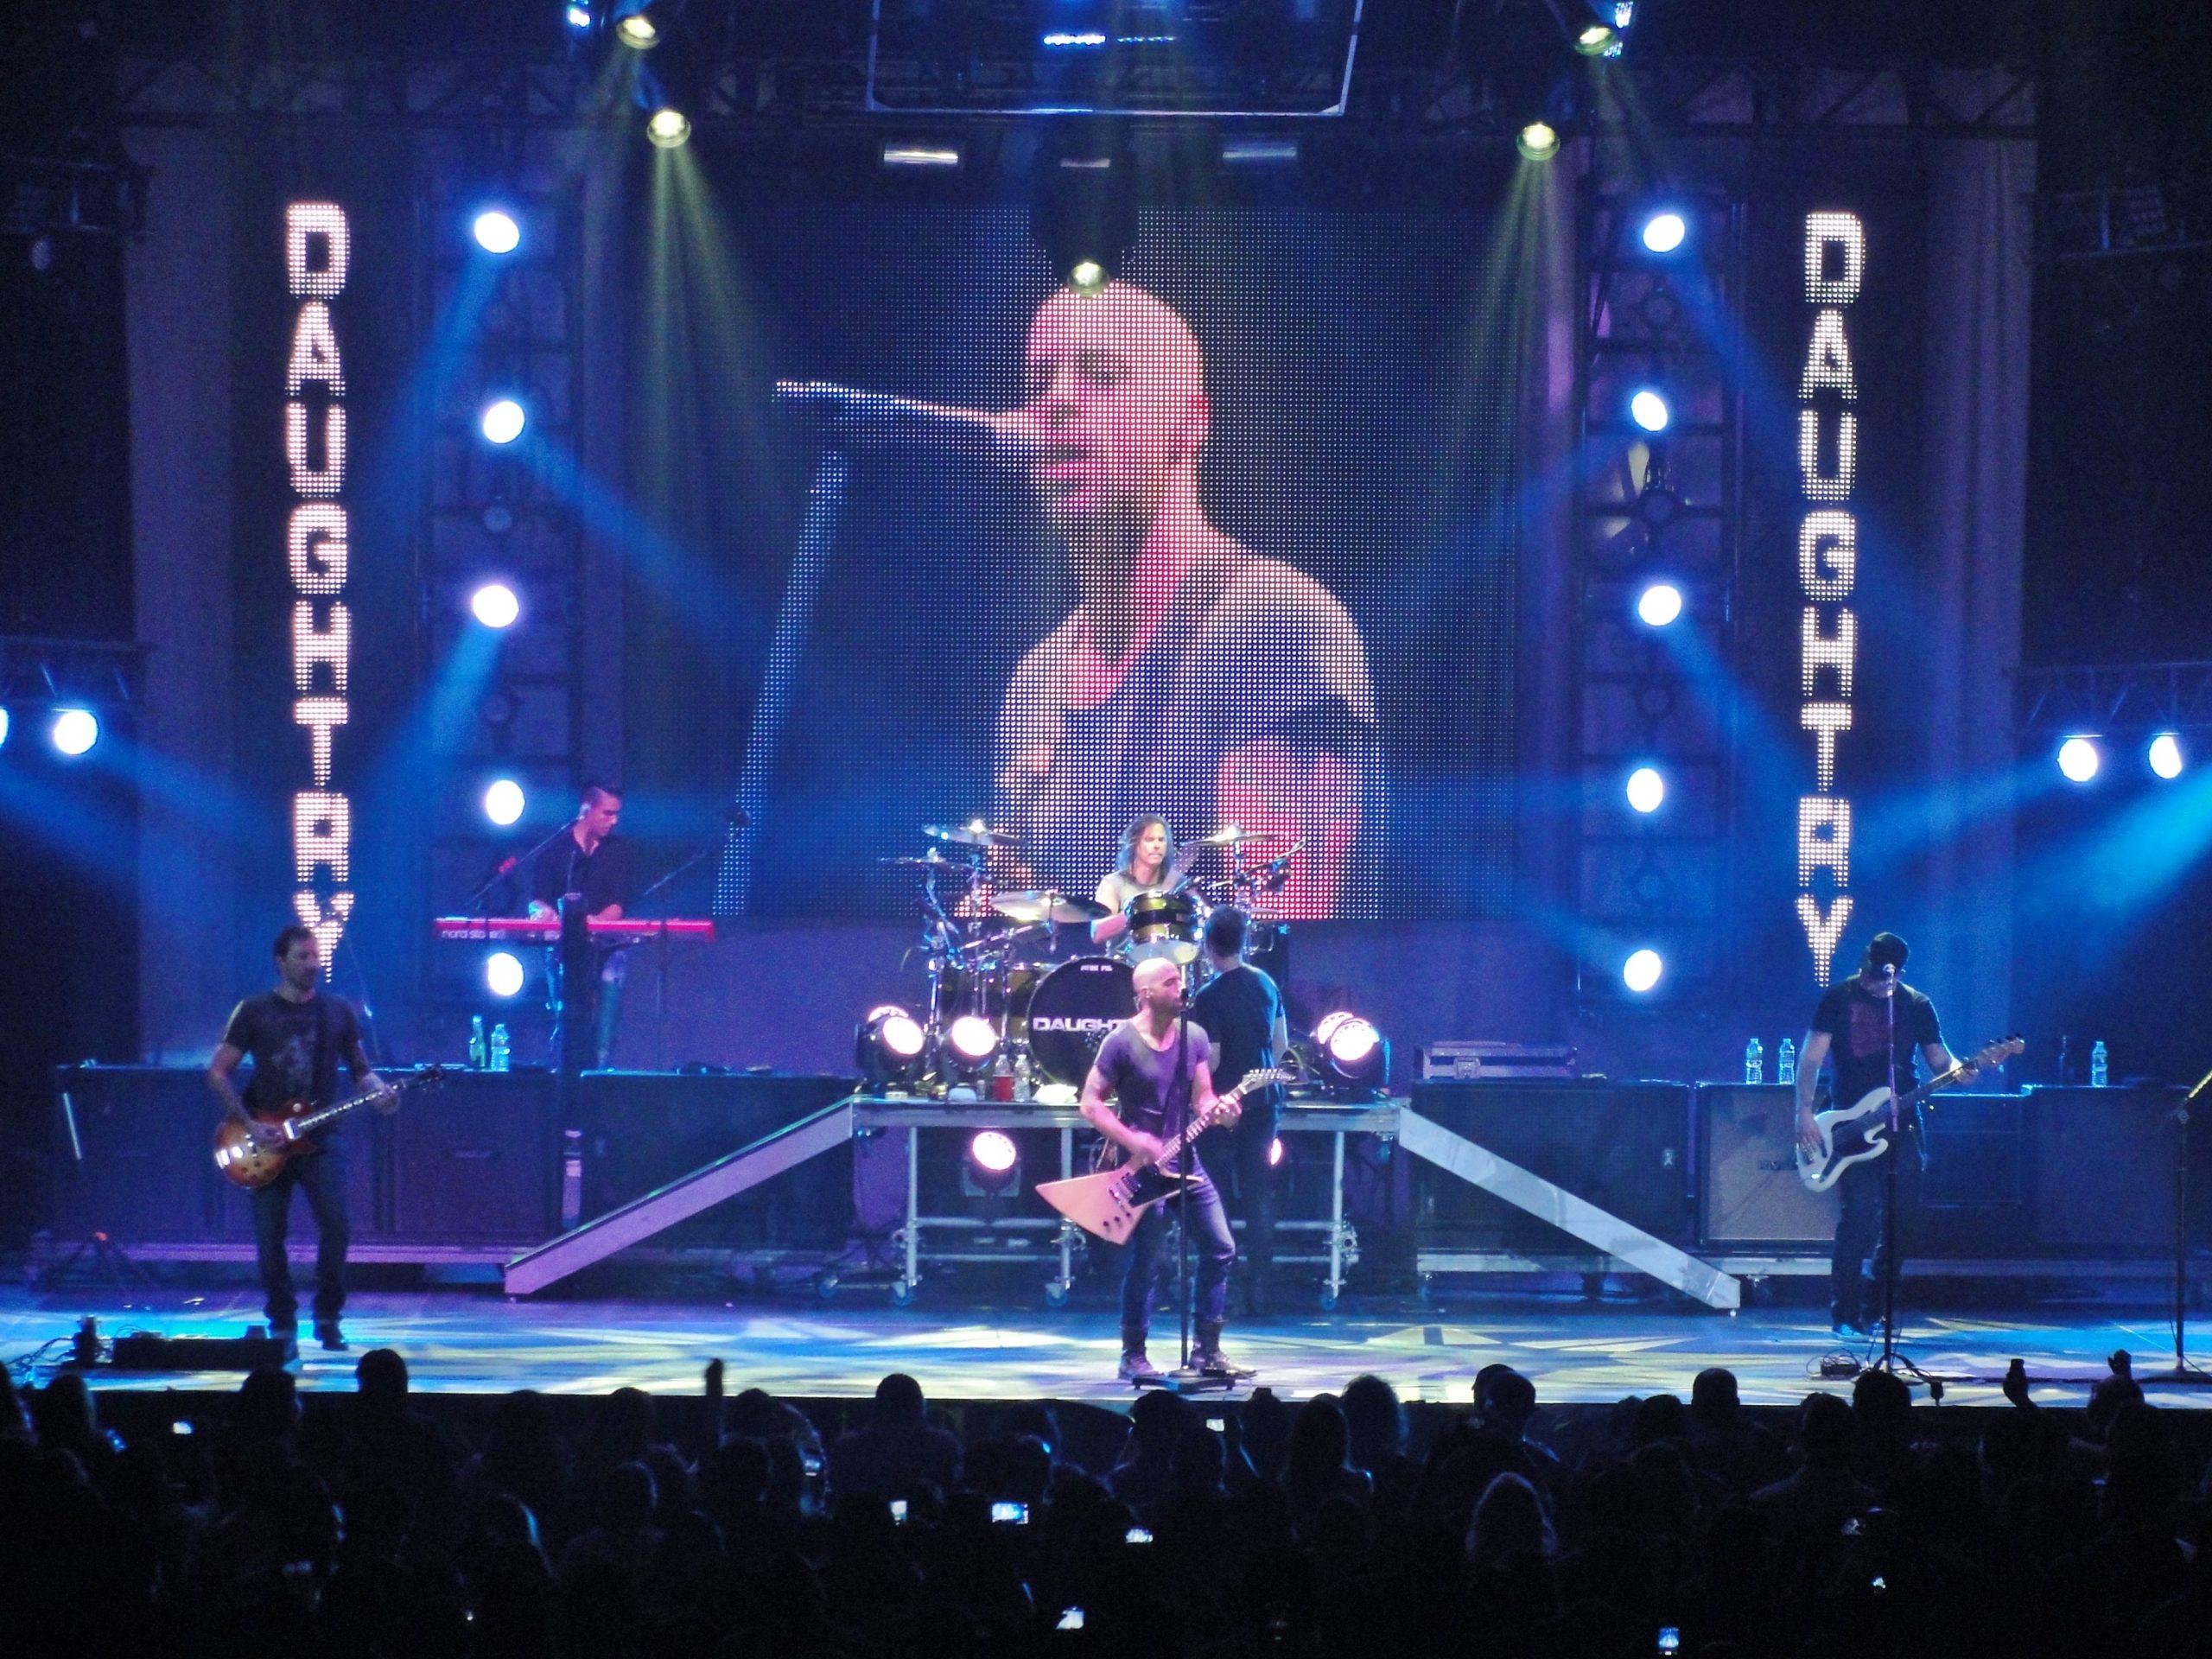 Daughtry tour 2020